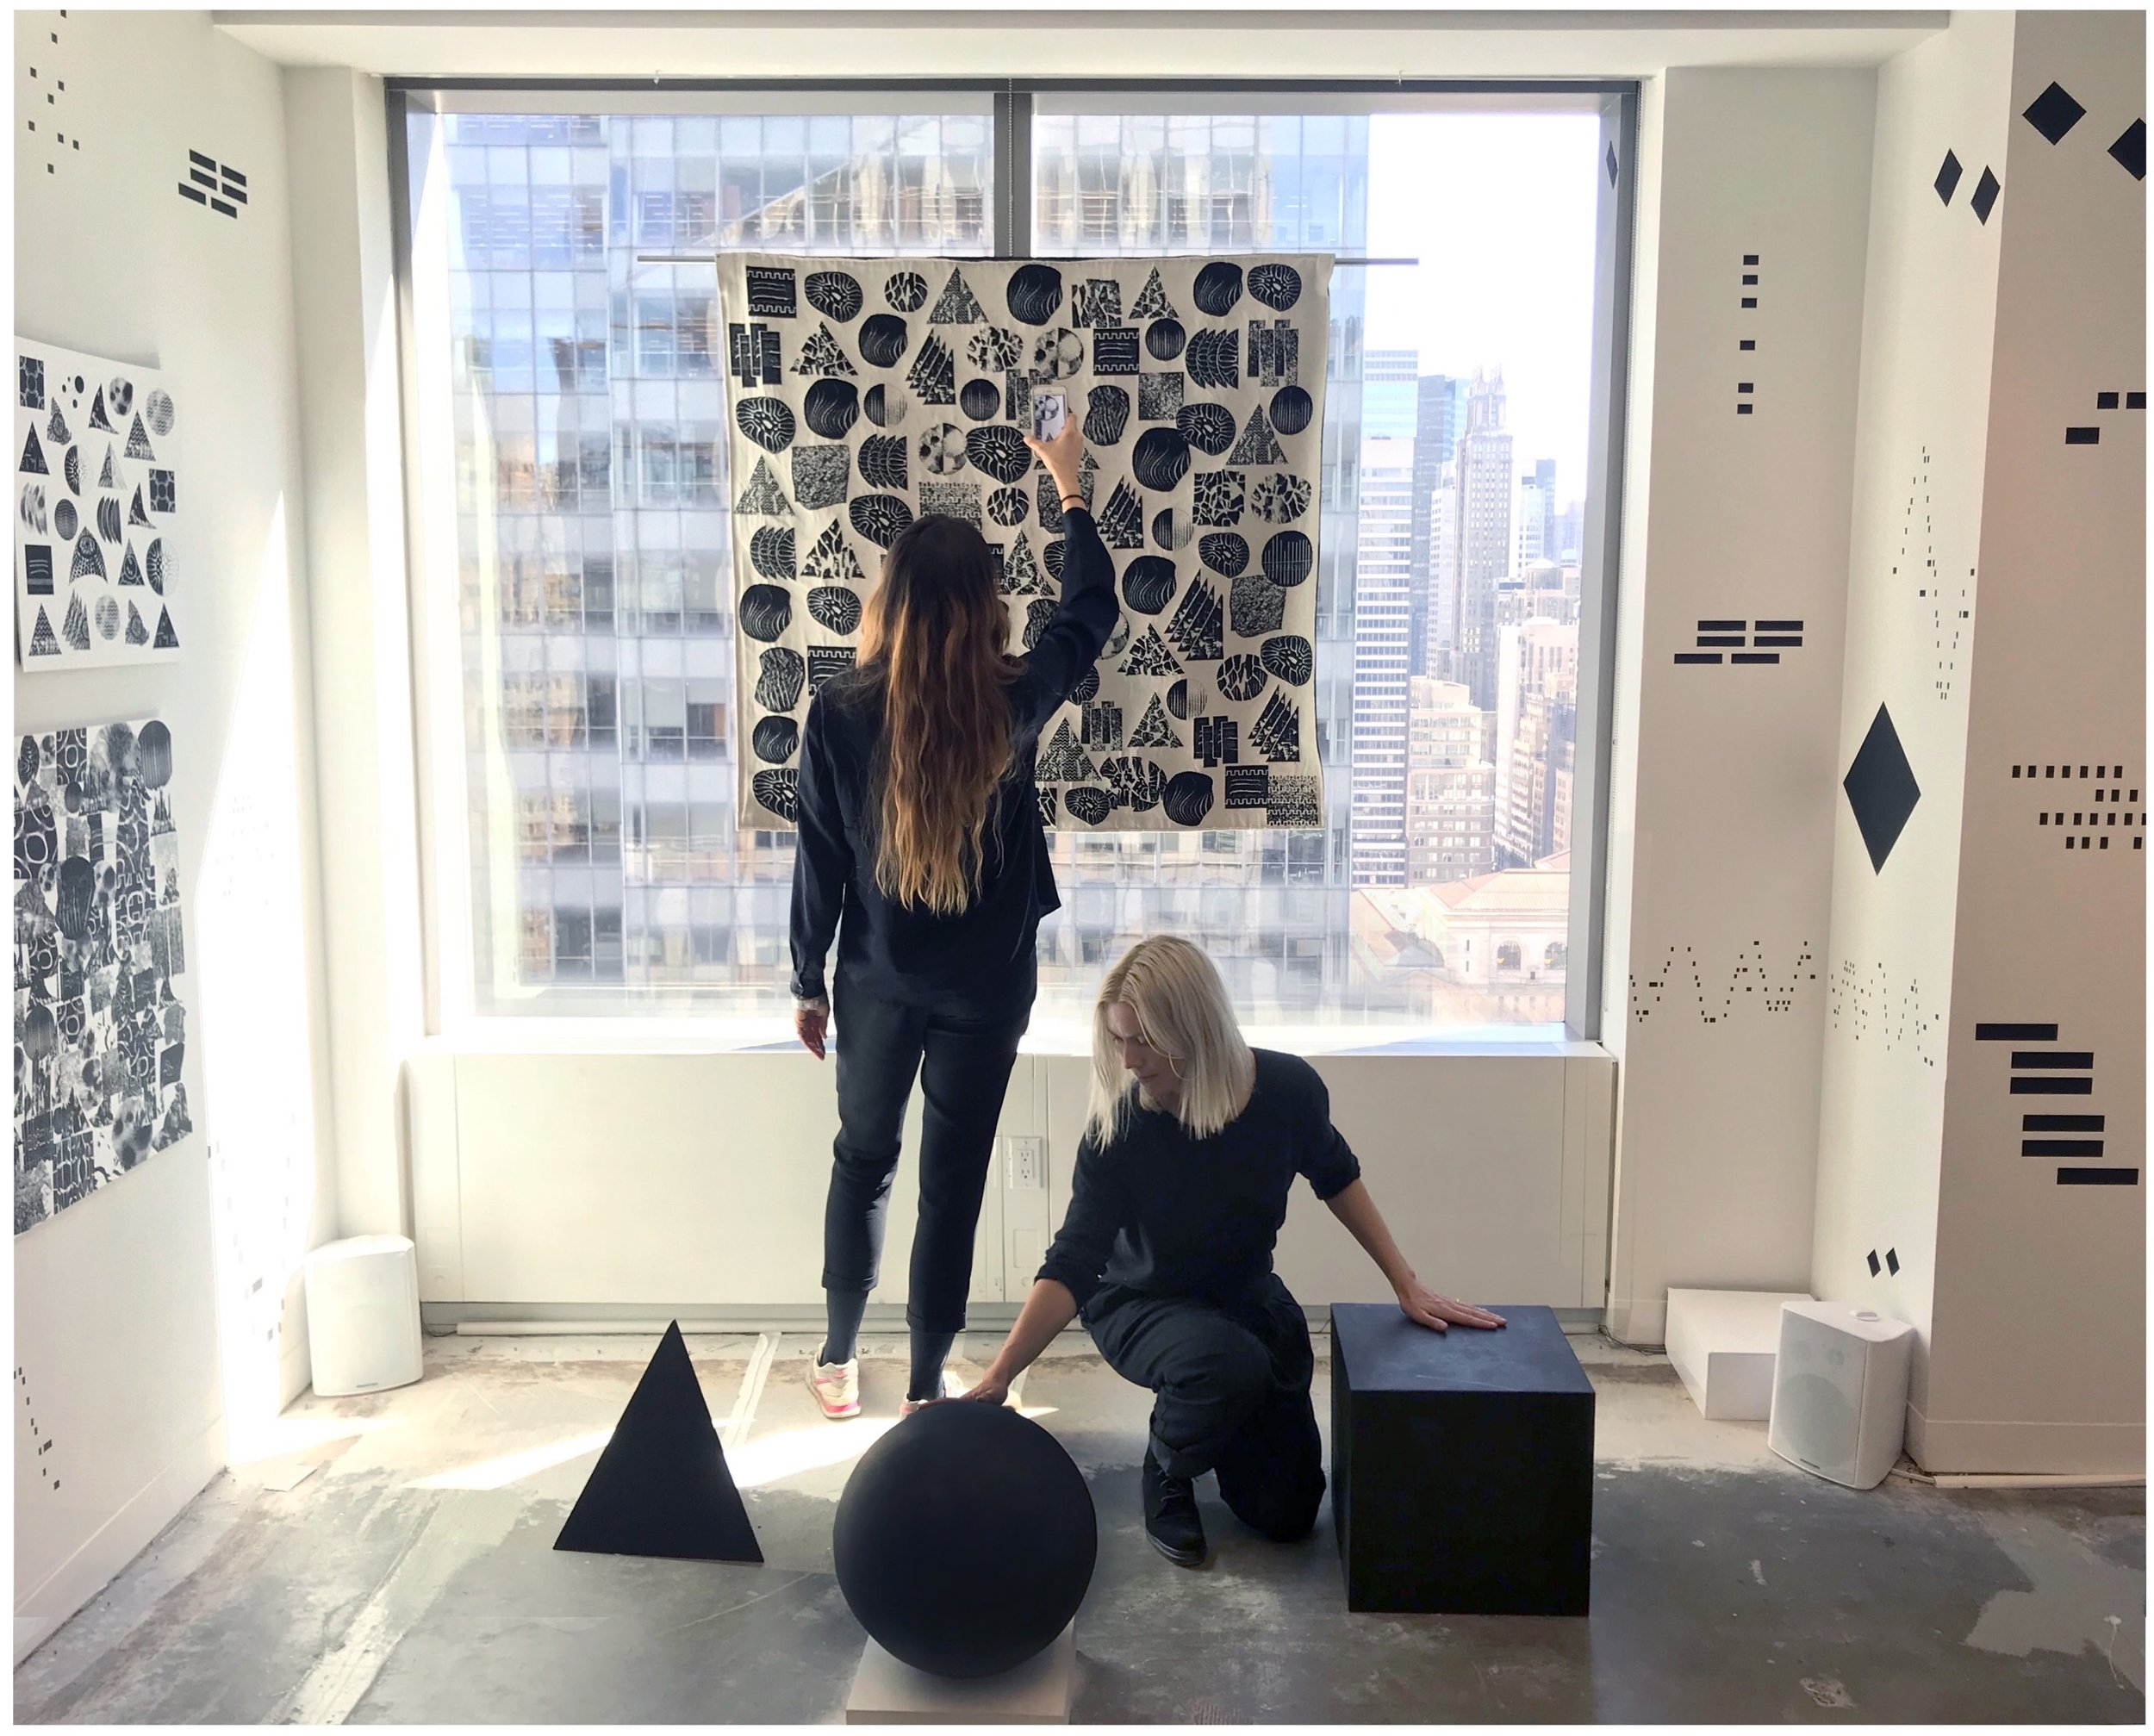 Louise Foo (left) and Martha Skou (right) Spring Break Art Show, 2018